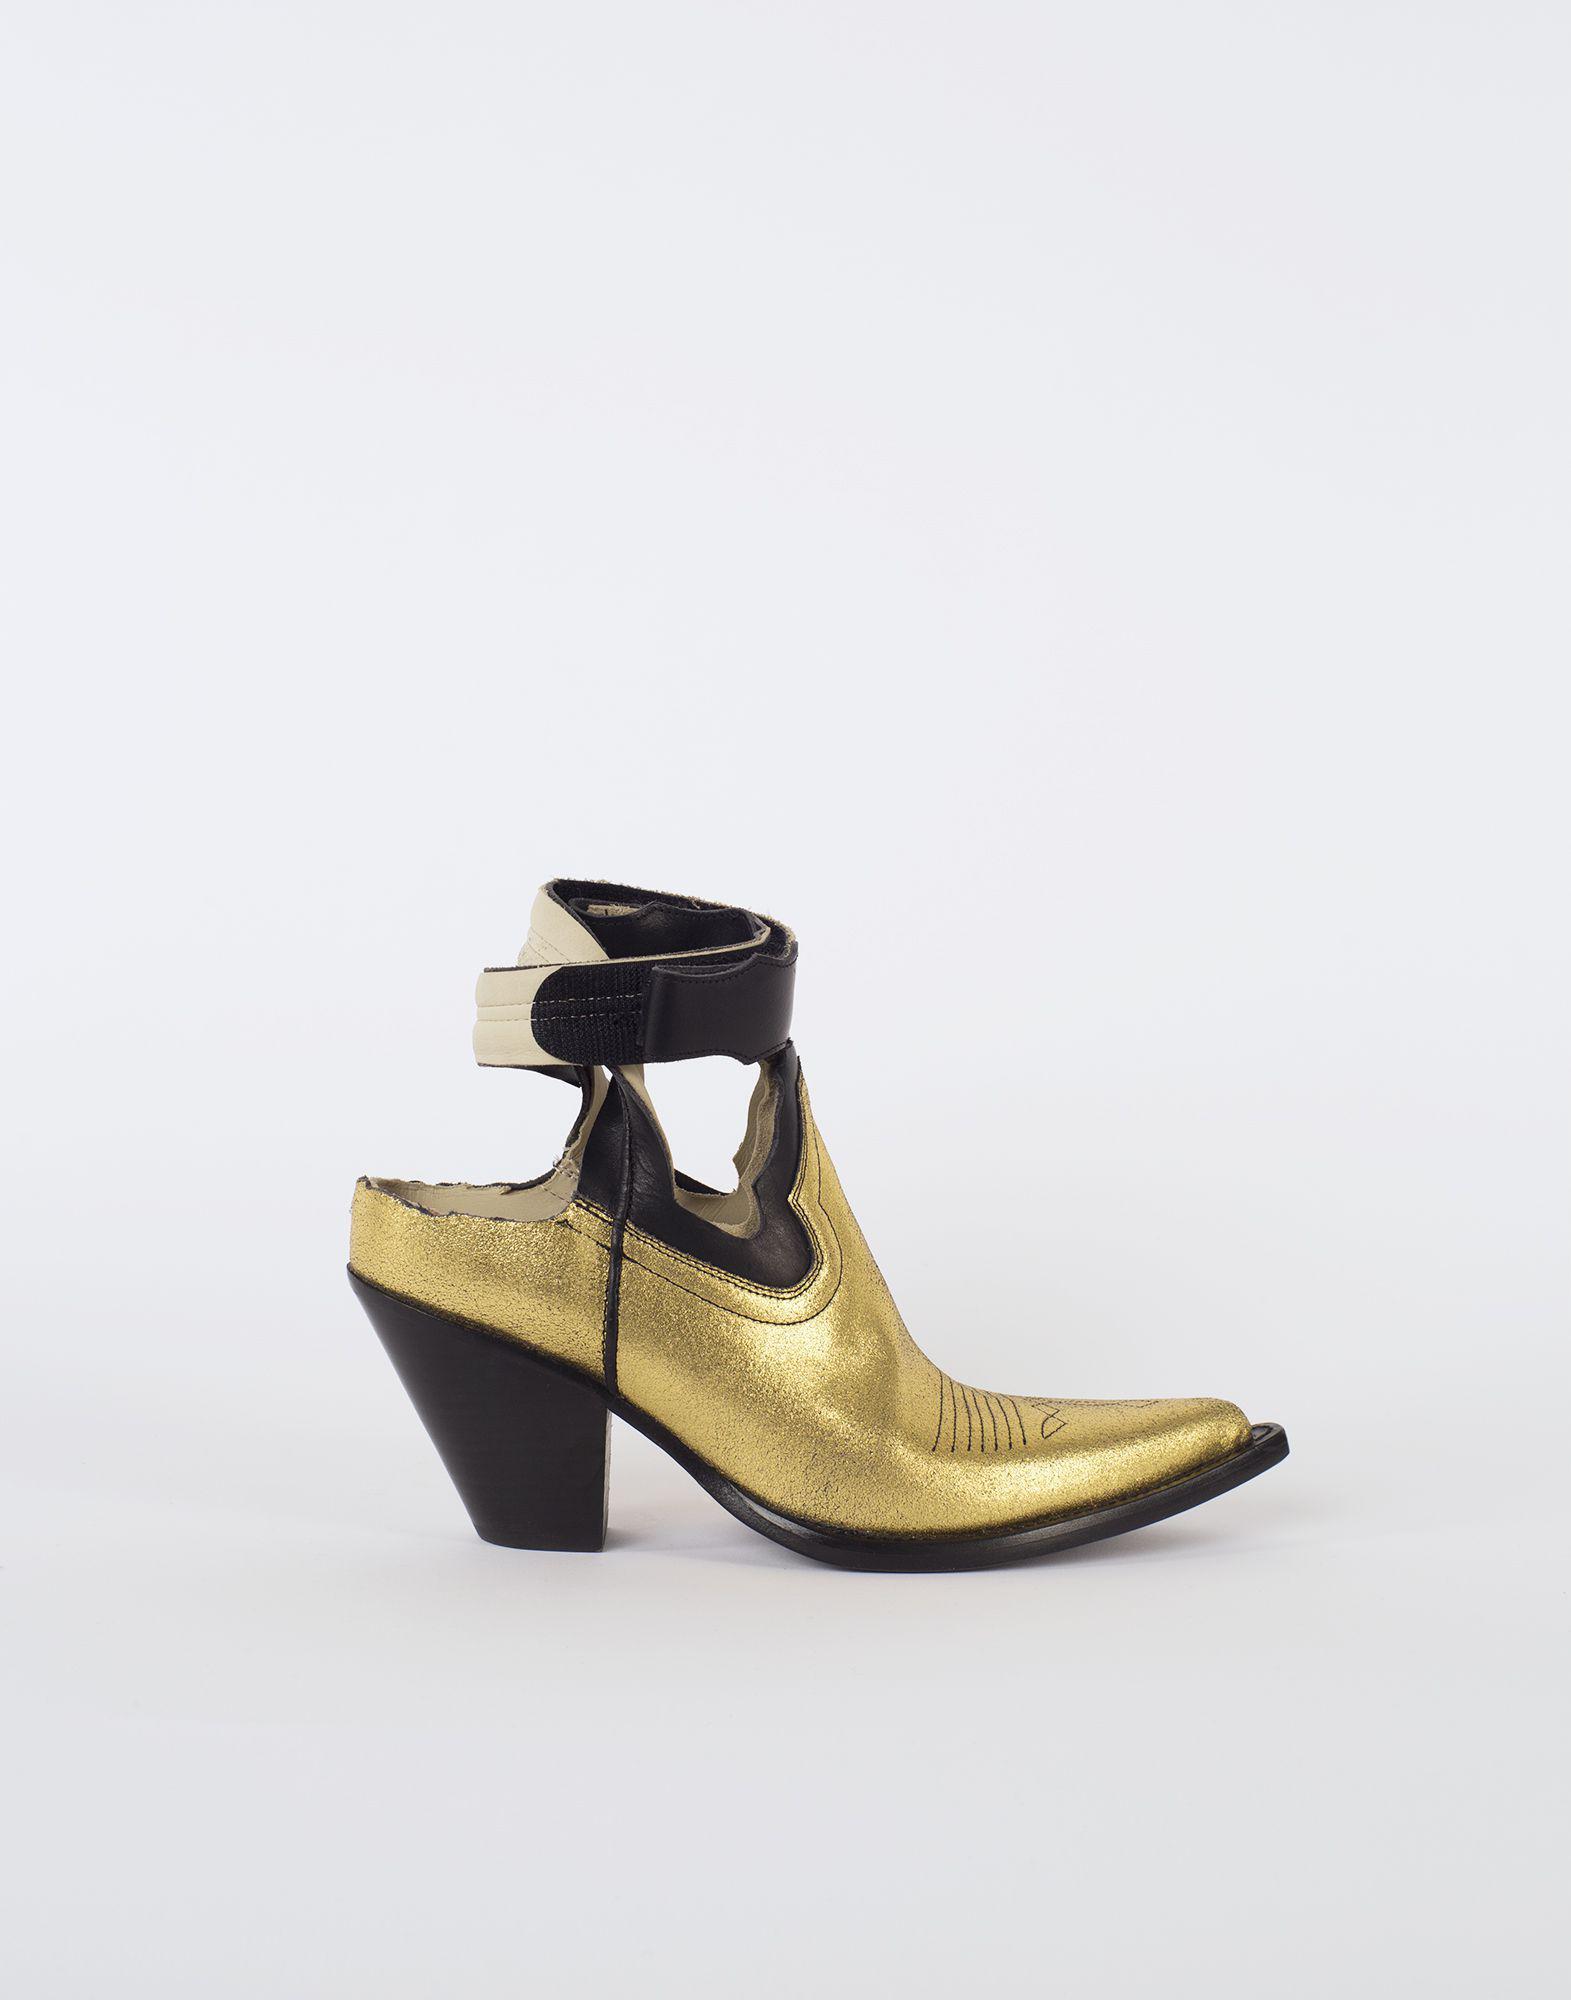 Maison Margiela. Women's Metallic Gold Cut-out Cowboy Boots